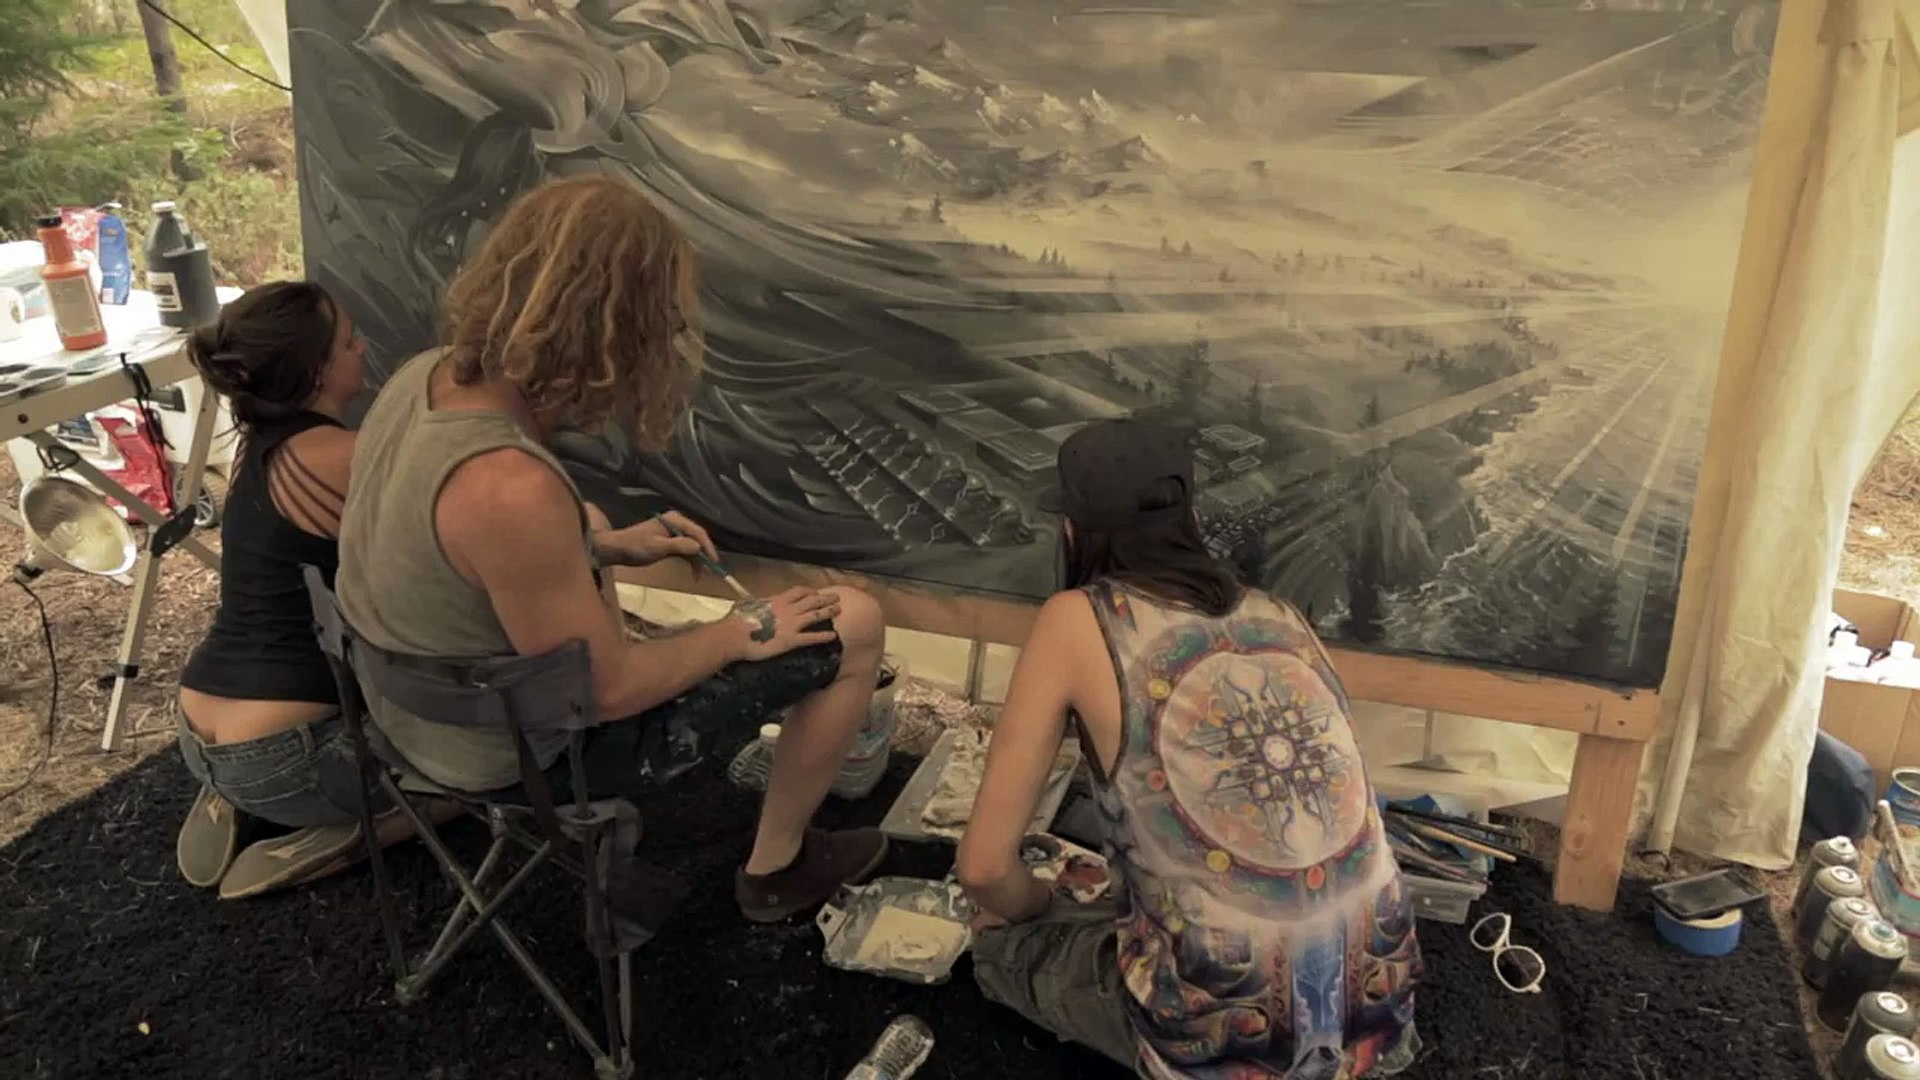 27/58 Jonathan Solter, Seth McMahon, Ashely Foreman live art collab @ Trinity River Jamboree 2015